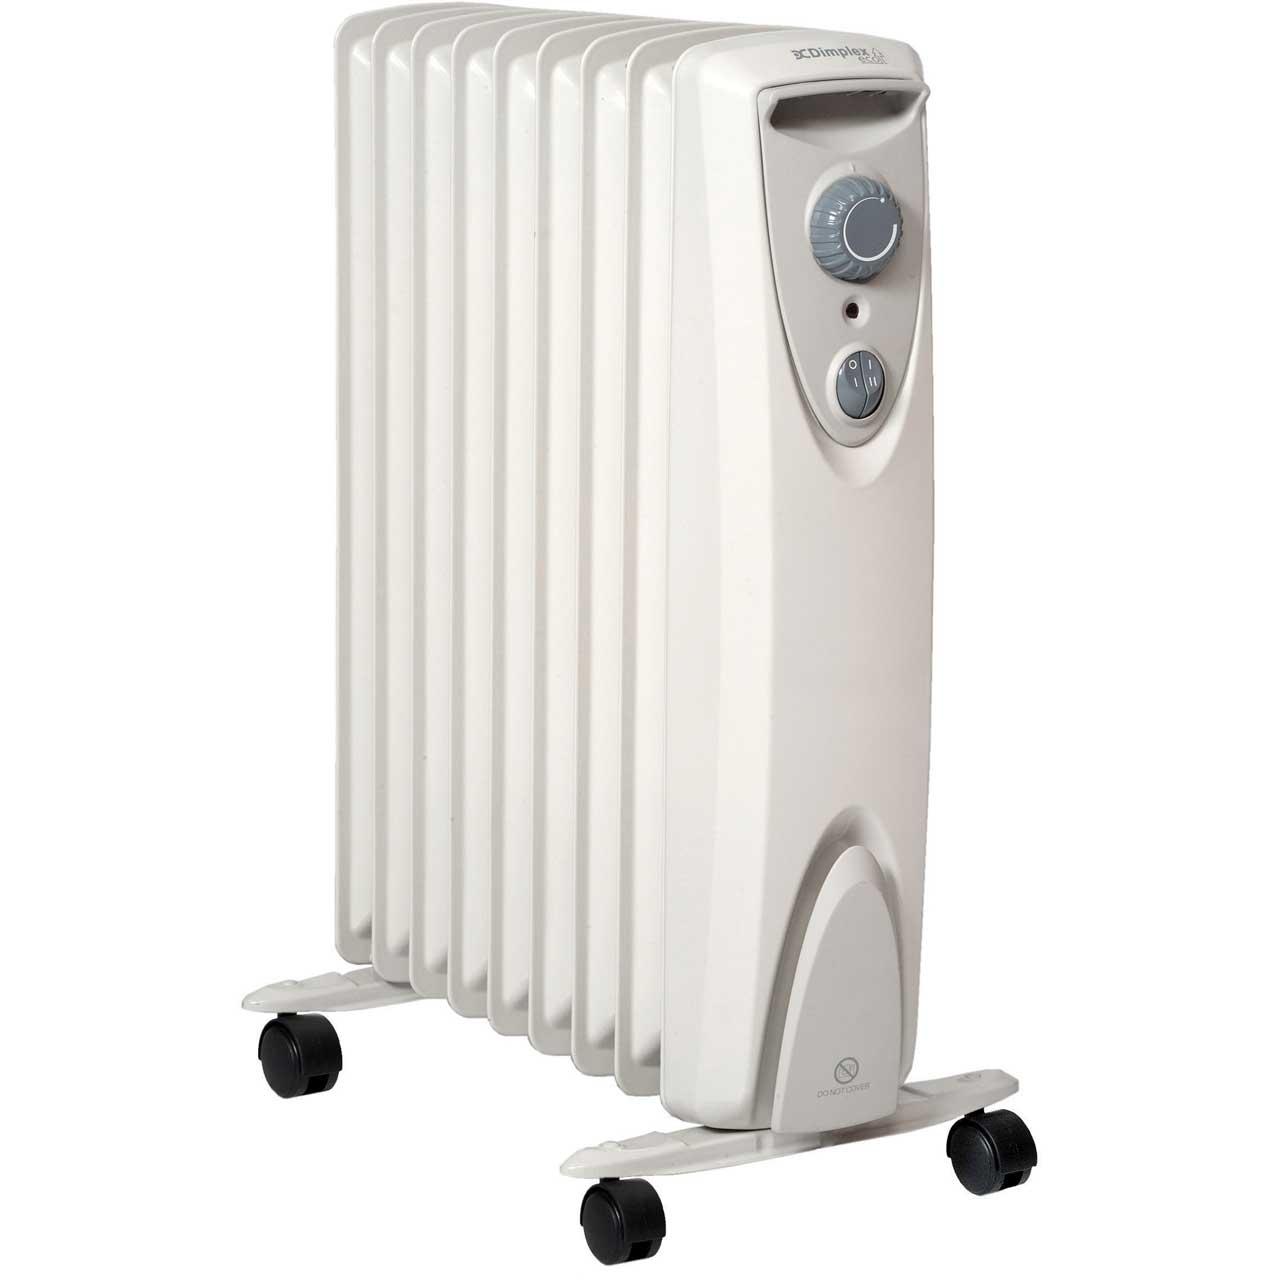 Dimplex OFRC20N 2kW Oil Free Heater - Allersafe £59.99